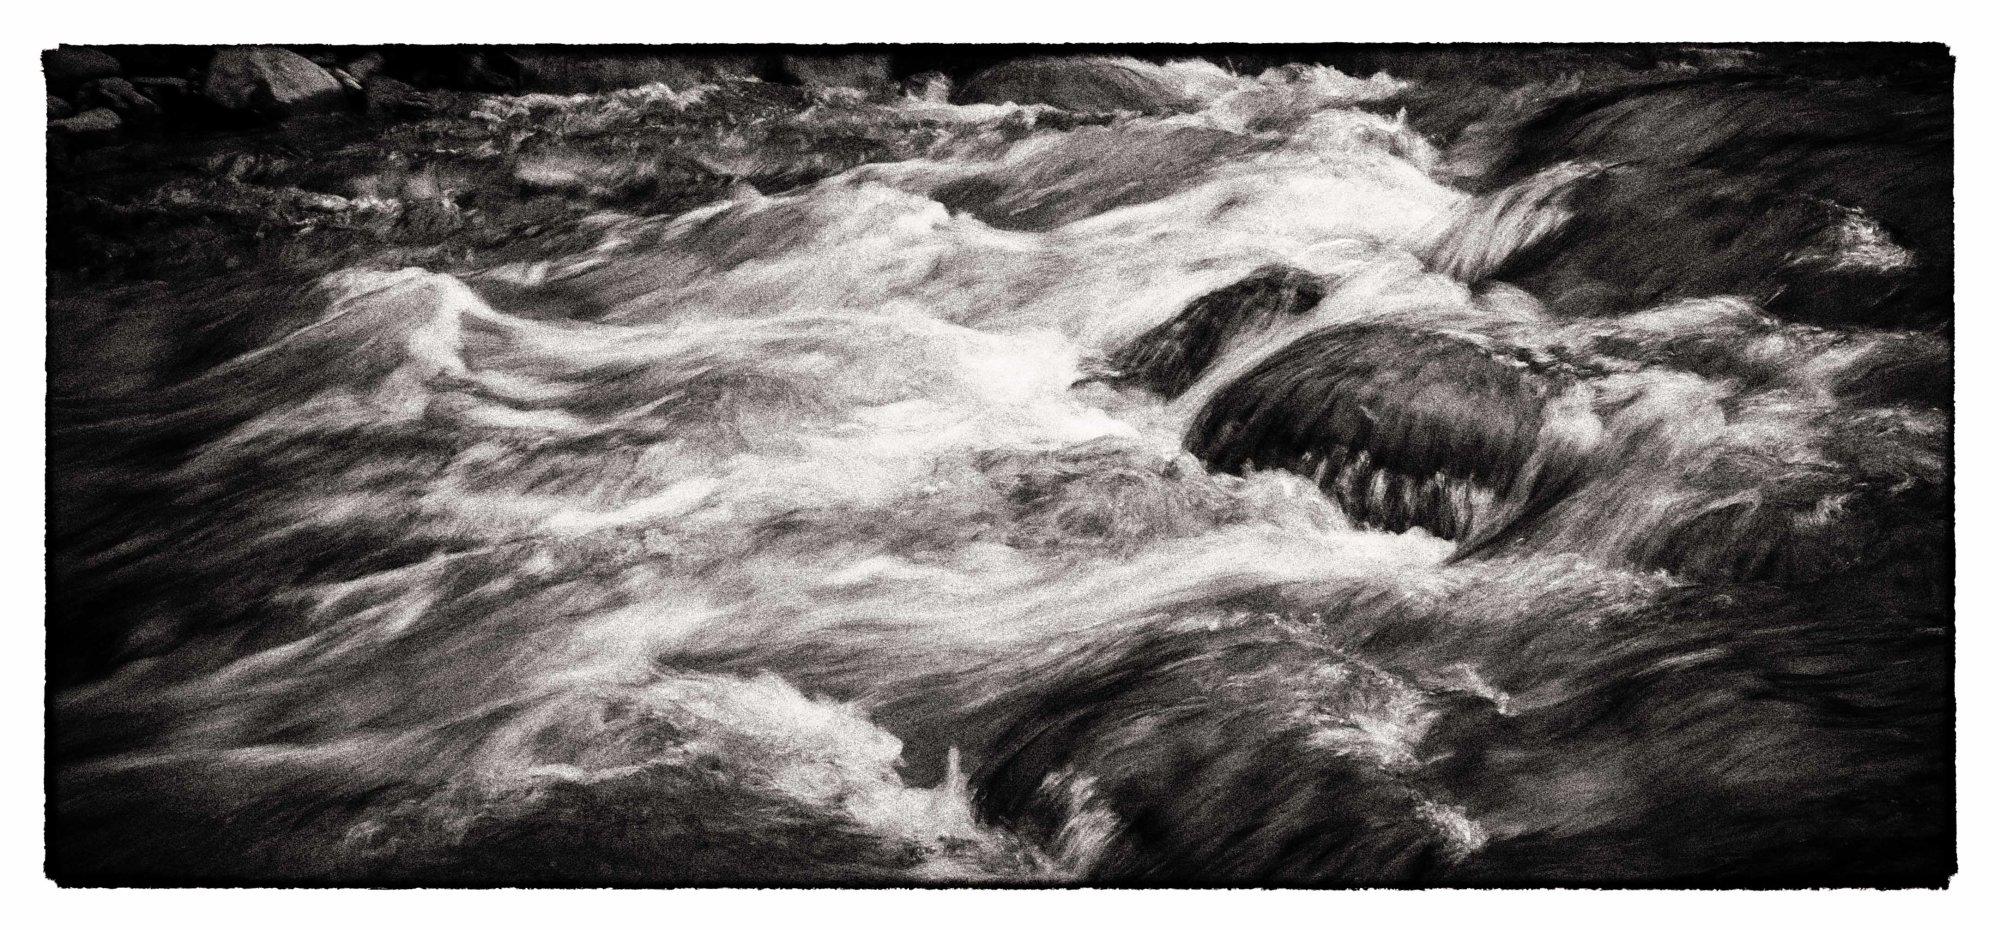 River flow in panoramic B&W